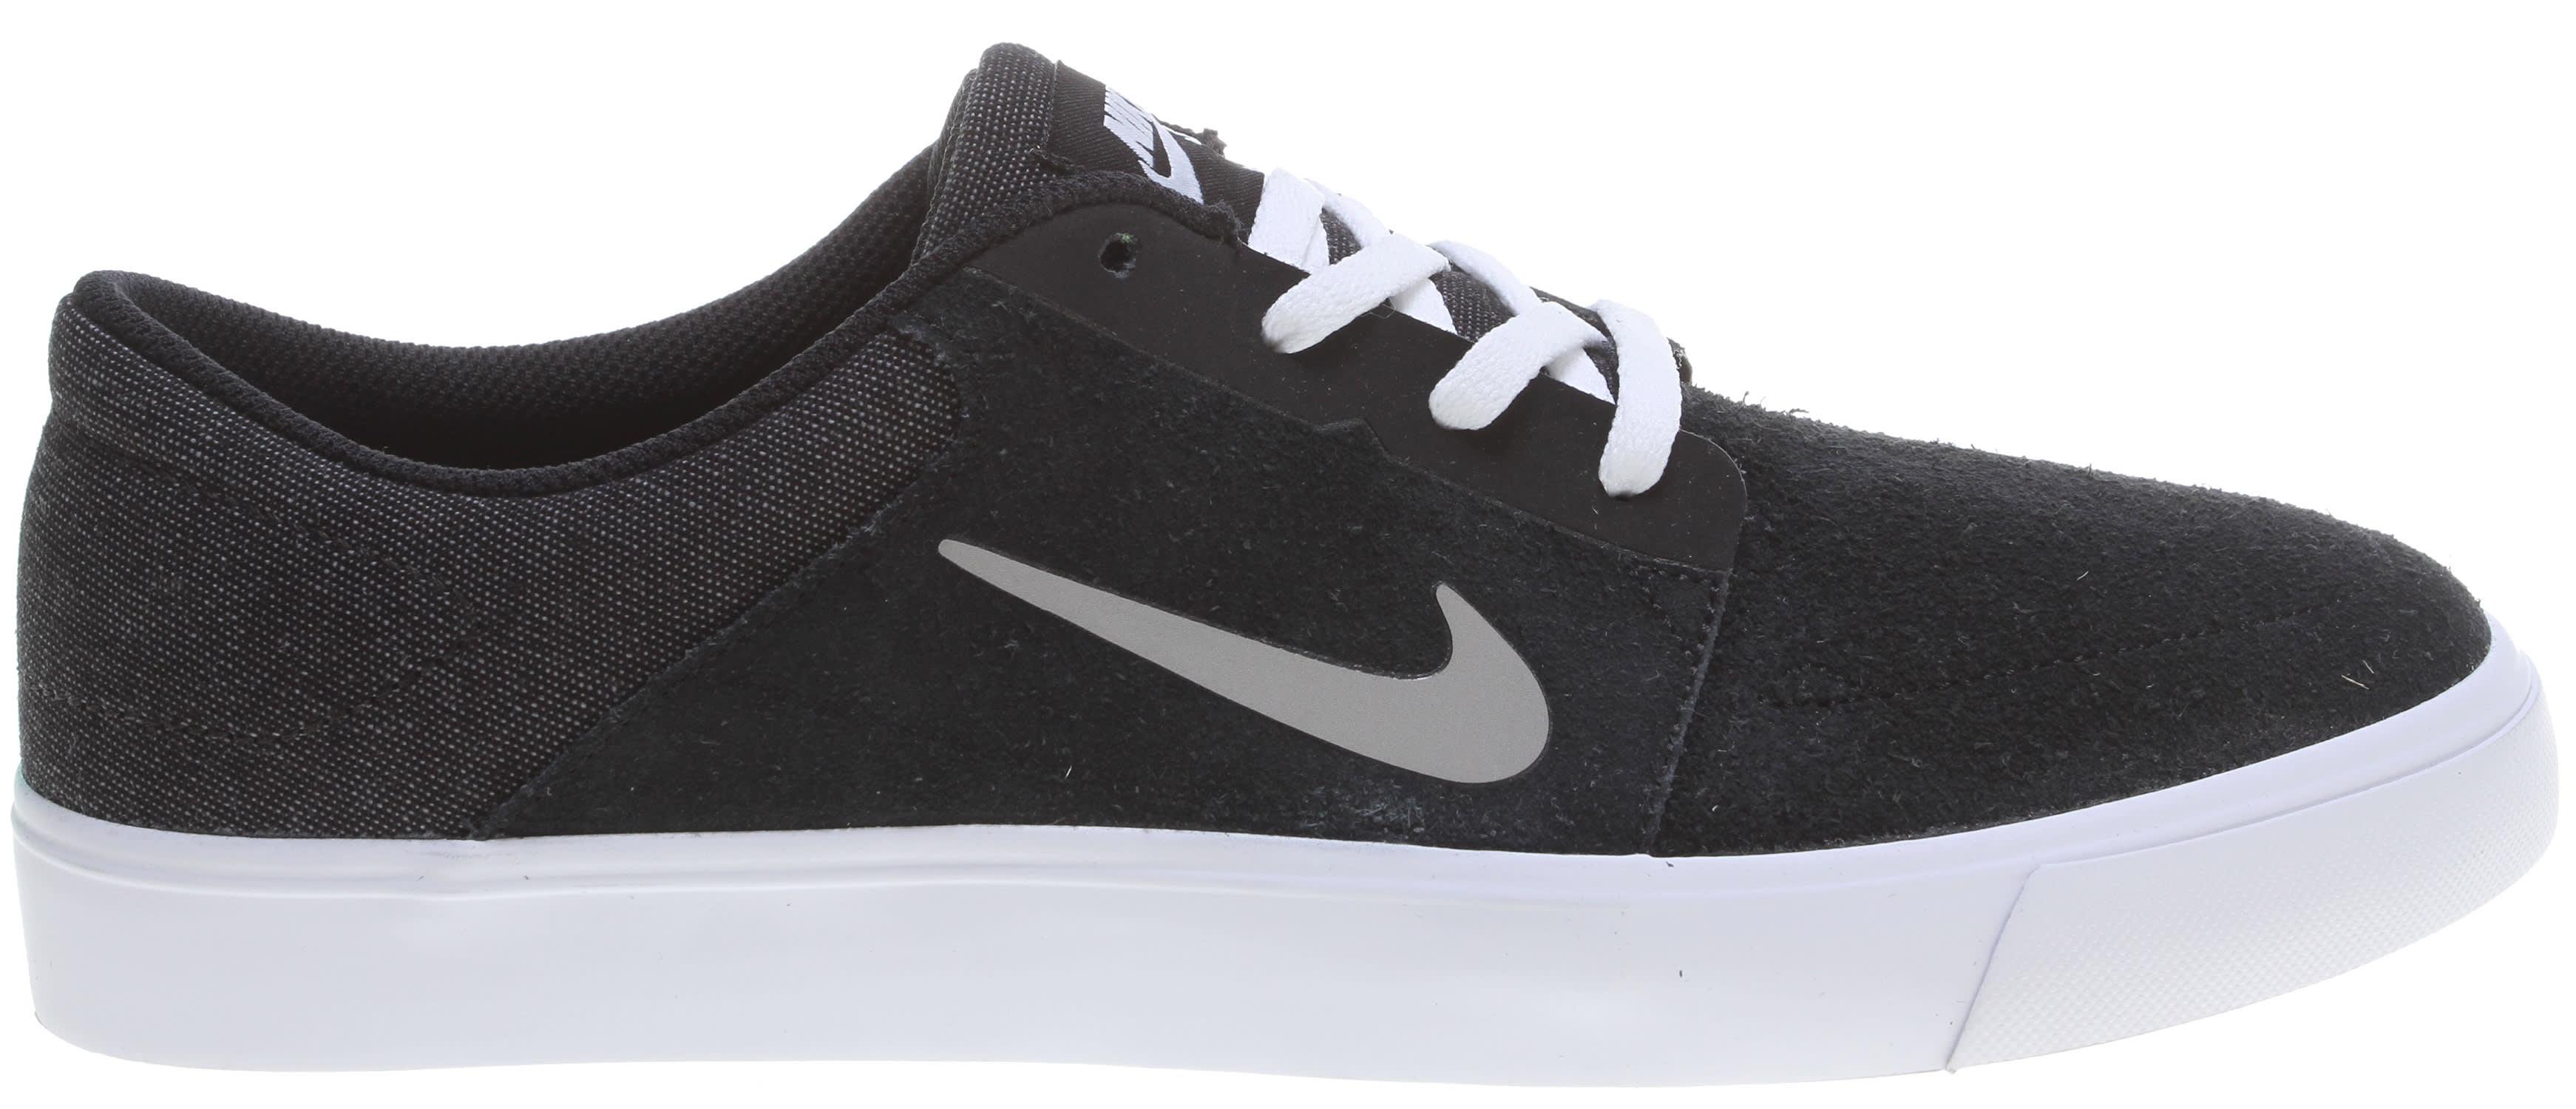 Tennis SB Portmore Nike